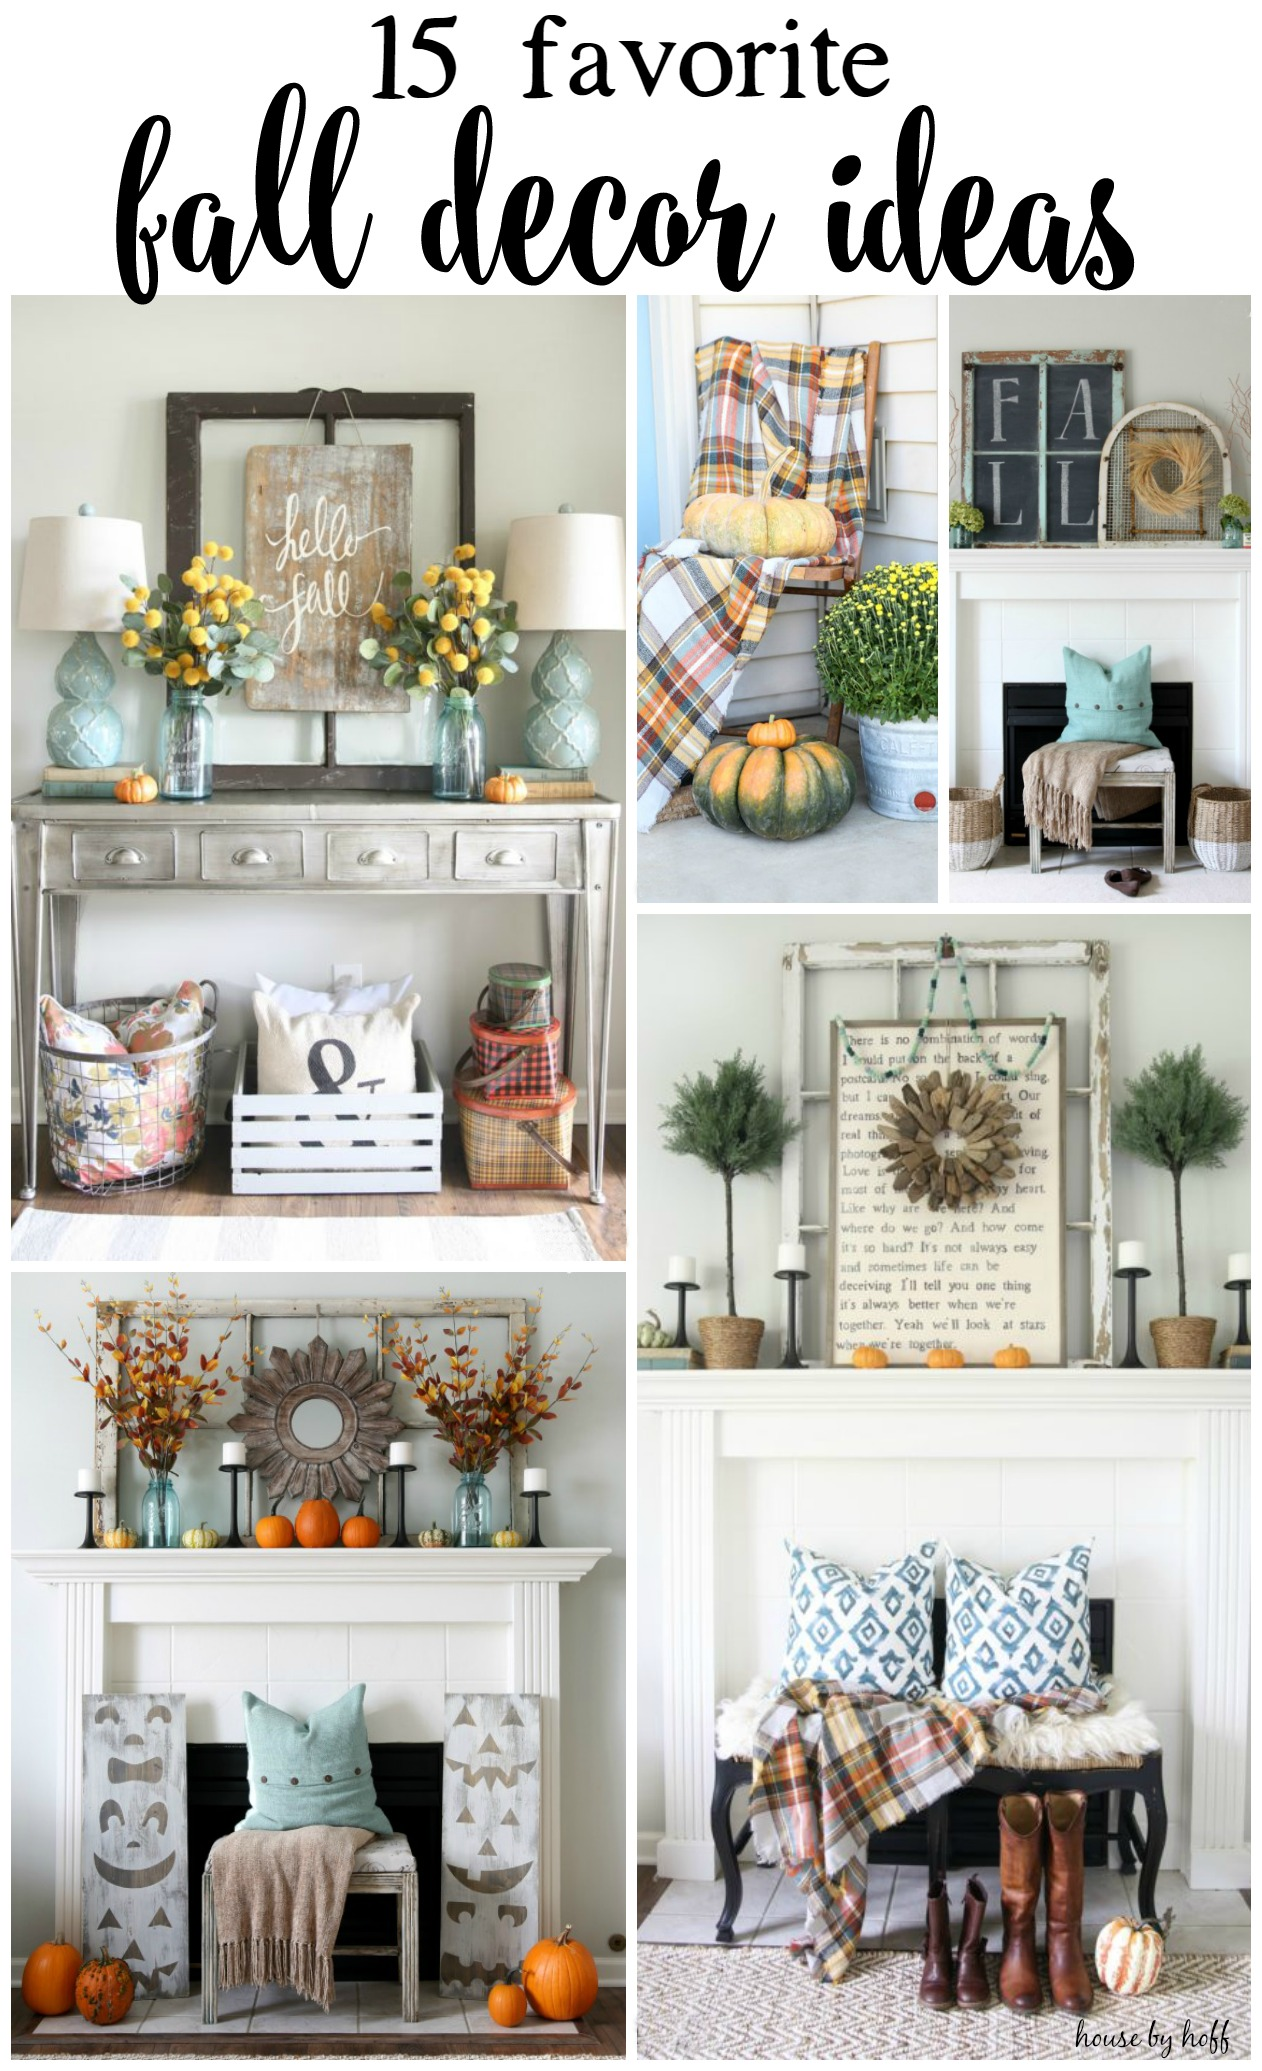 15 Favorite Fall Decor Ideas House by Hoff